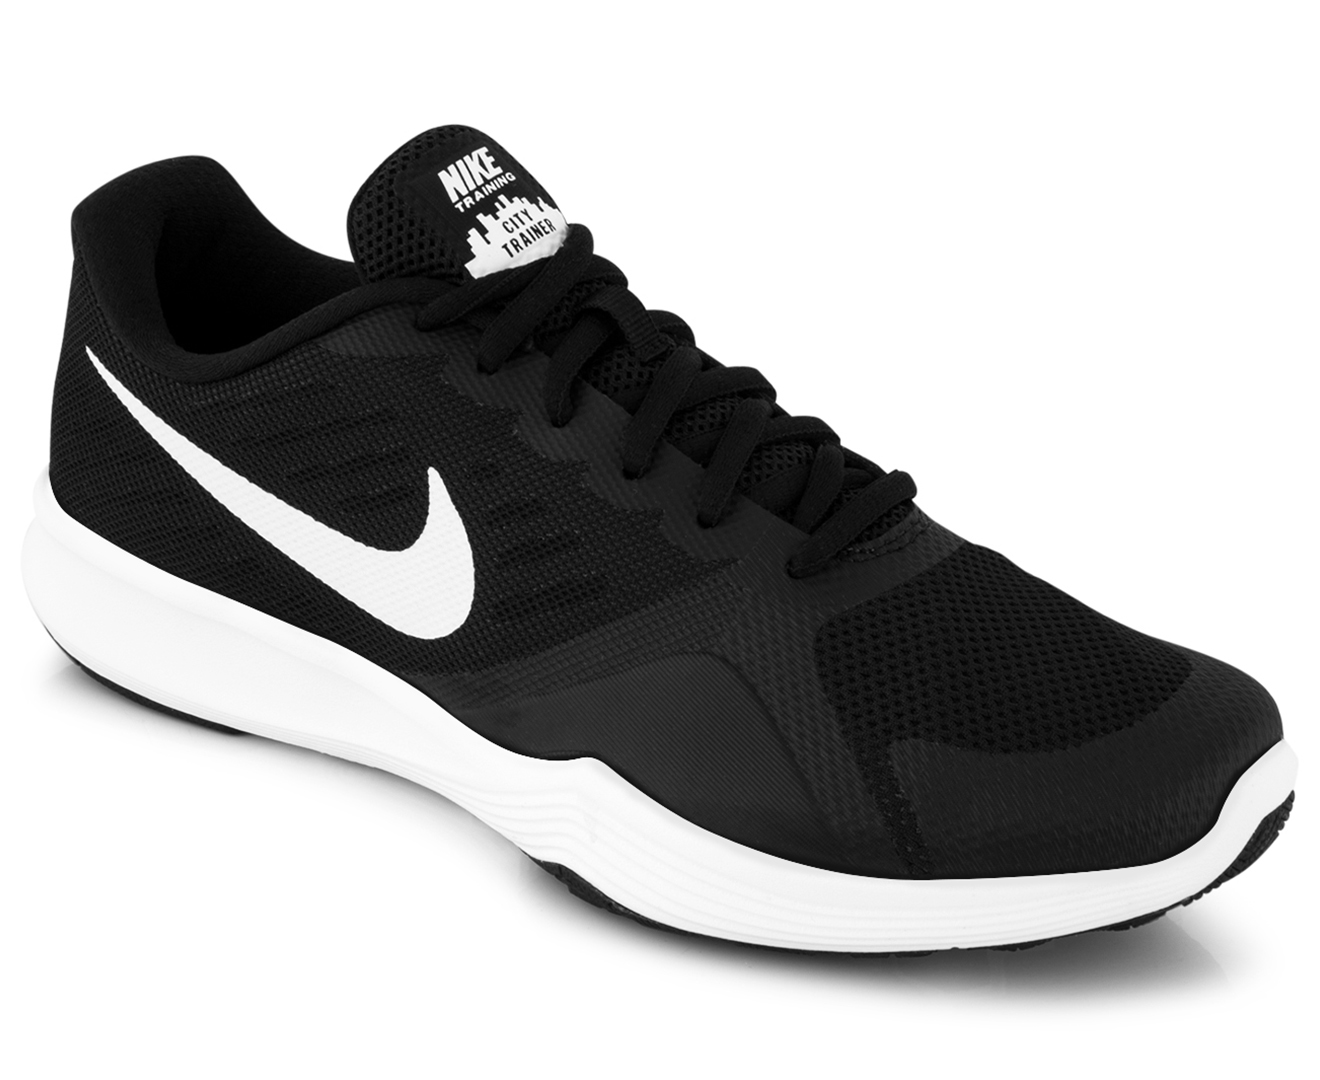 bbd224f89cf2 Nike Women s City Trainer Shoe - Black White